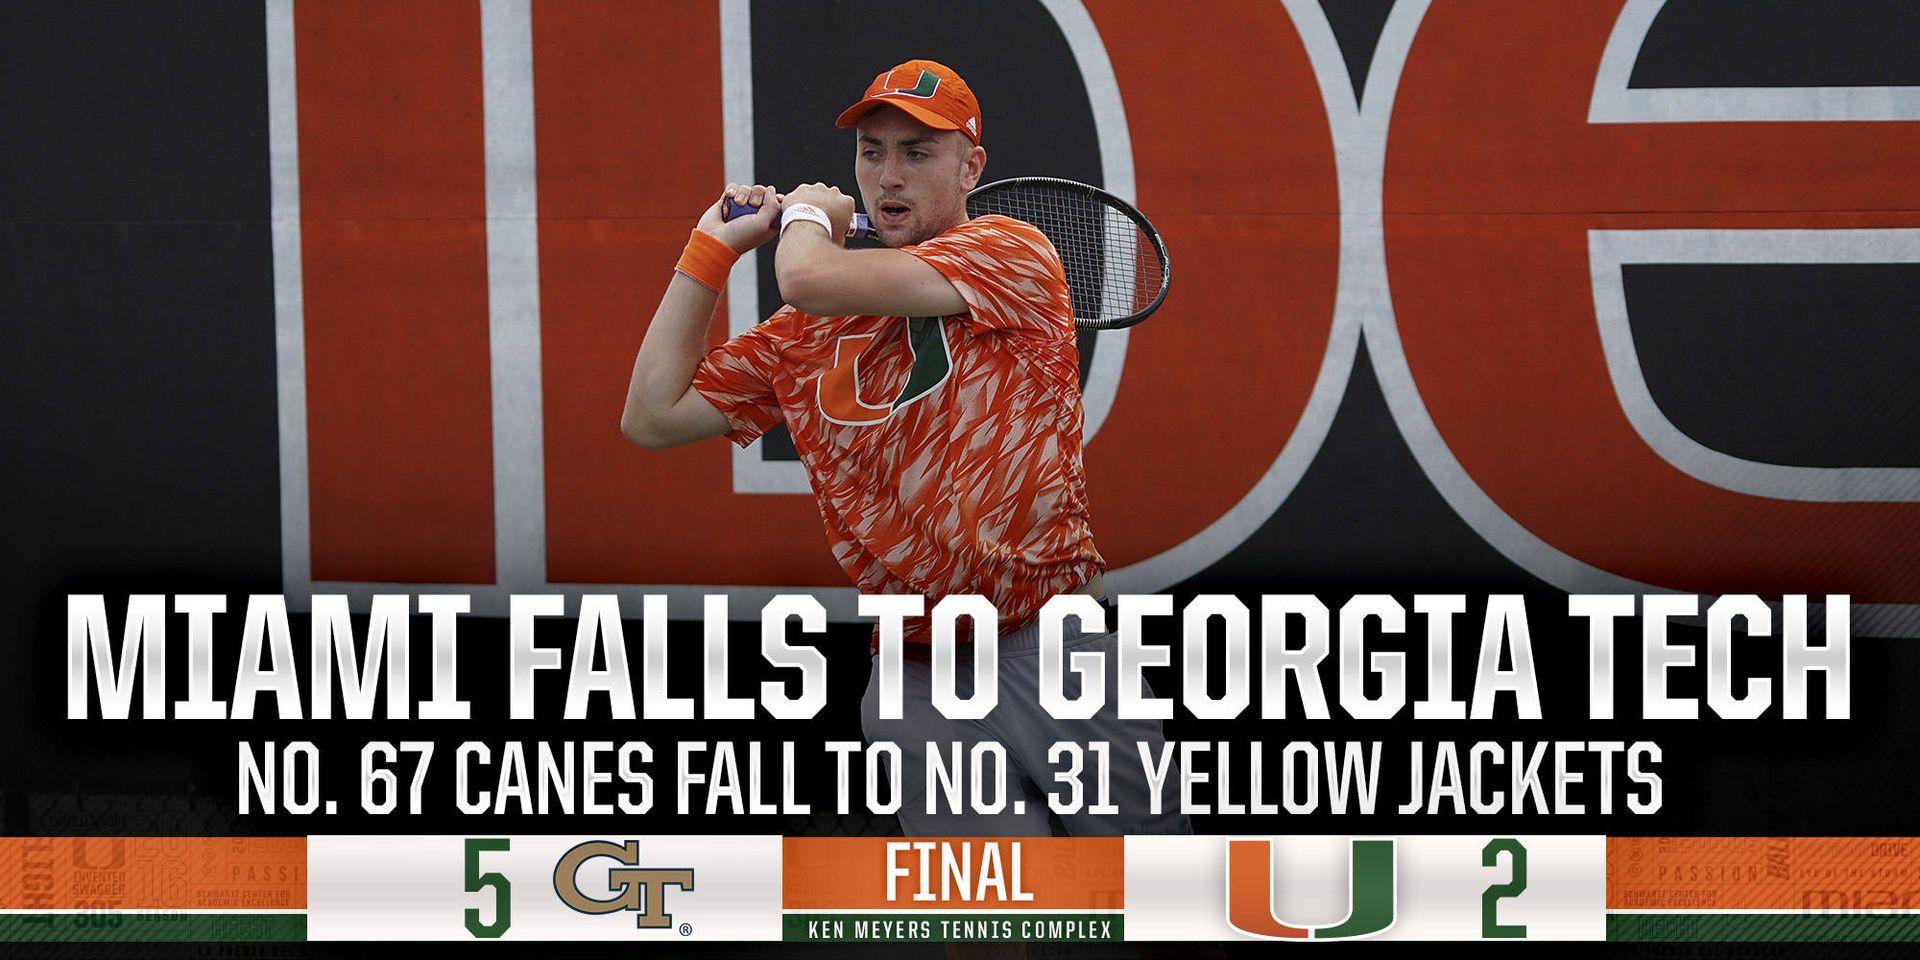 No. 67 Miami falls to No. 31 Georgia Tech